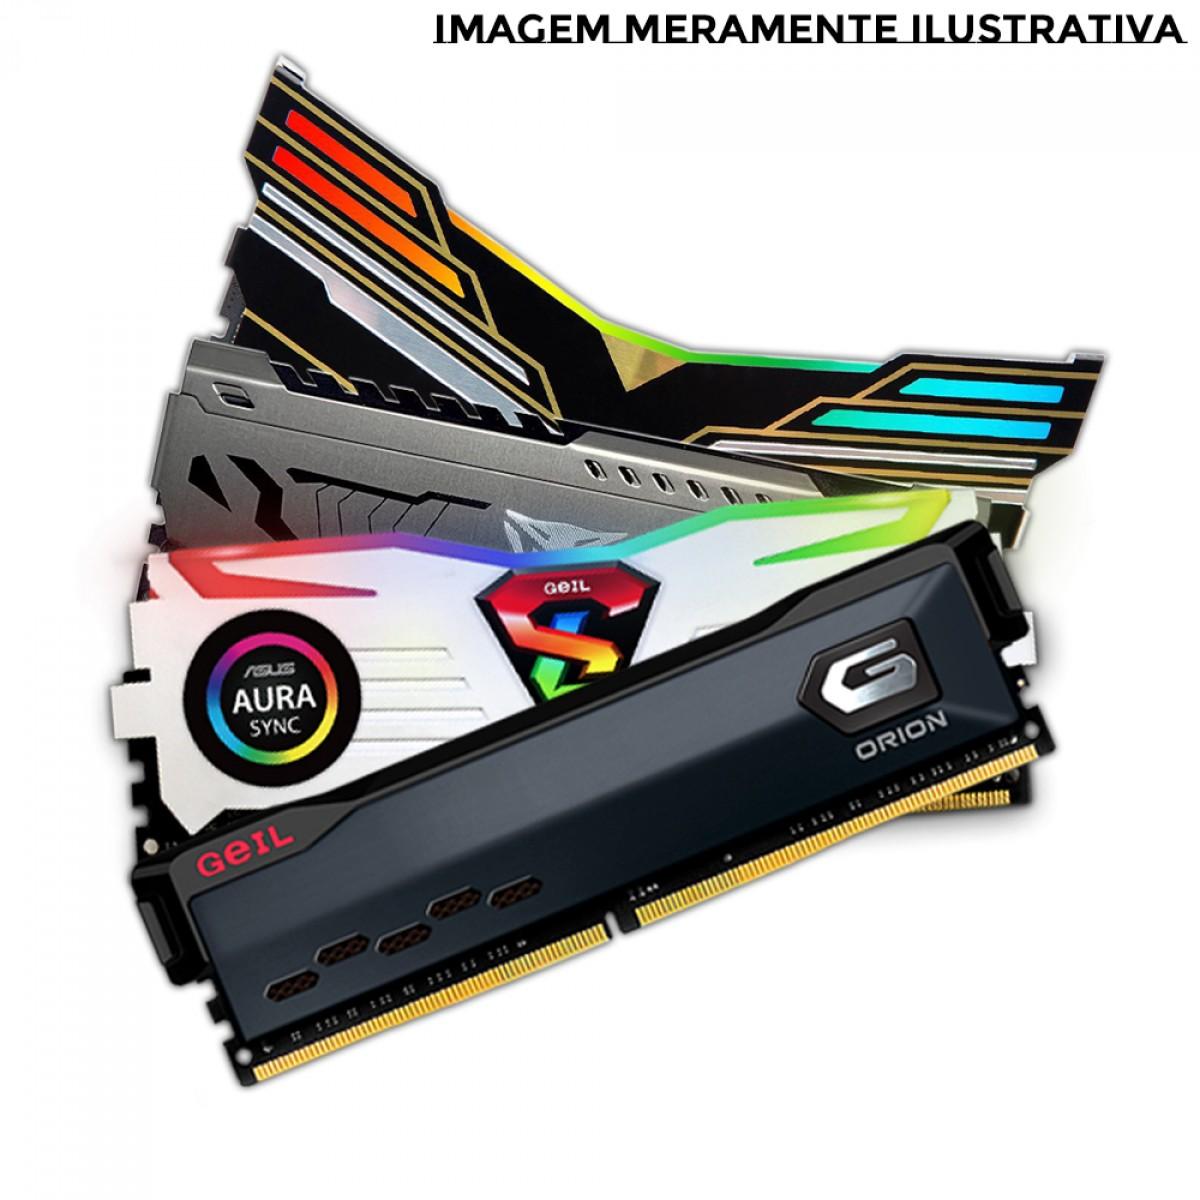 Kit Upgrade, ASUS PRIME B550M-K + AMD Ryzen 5 5600G + Memória DDR4, 16GB 3000MHz